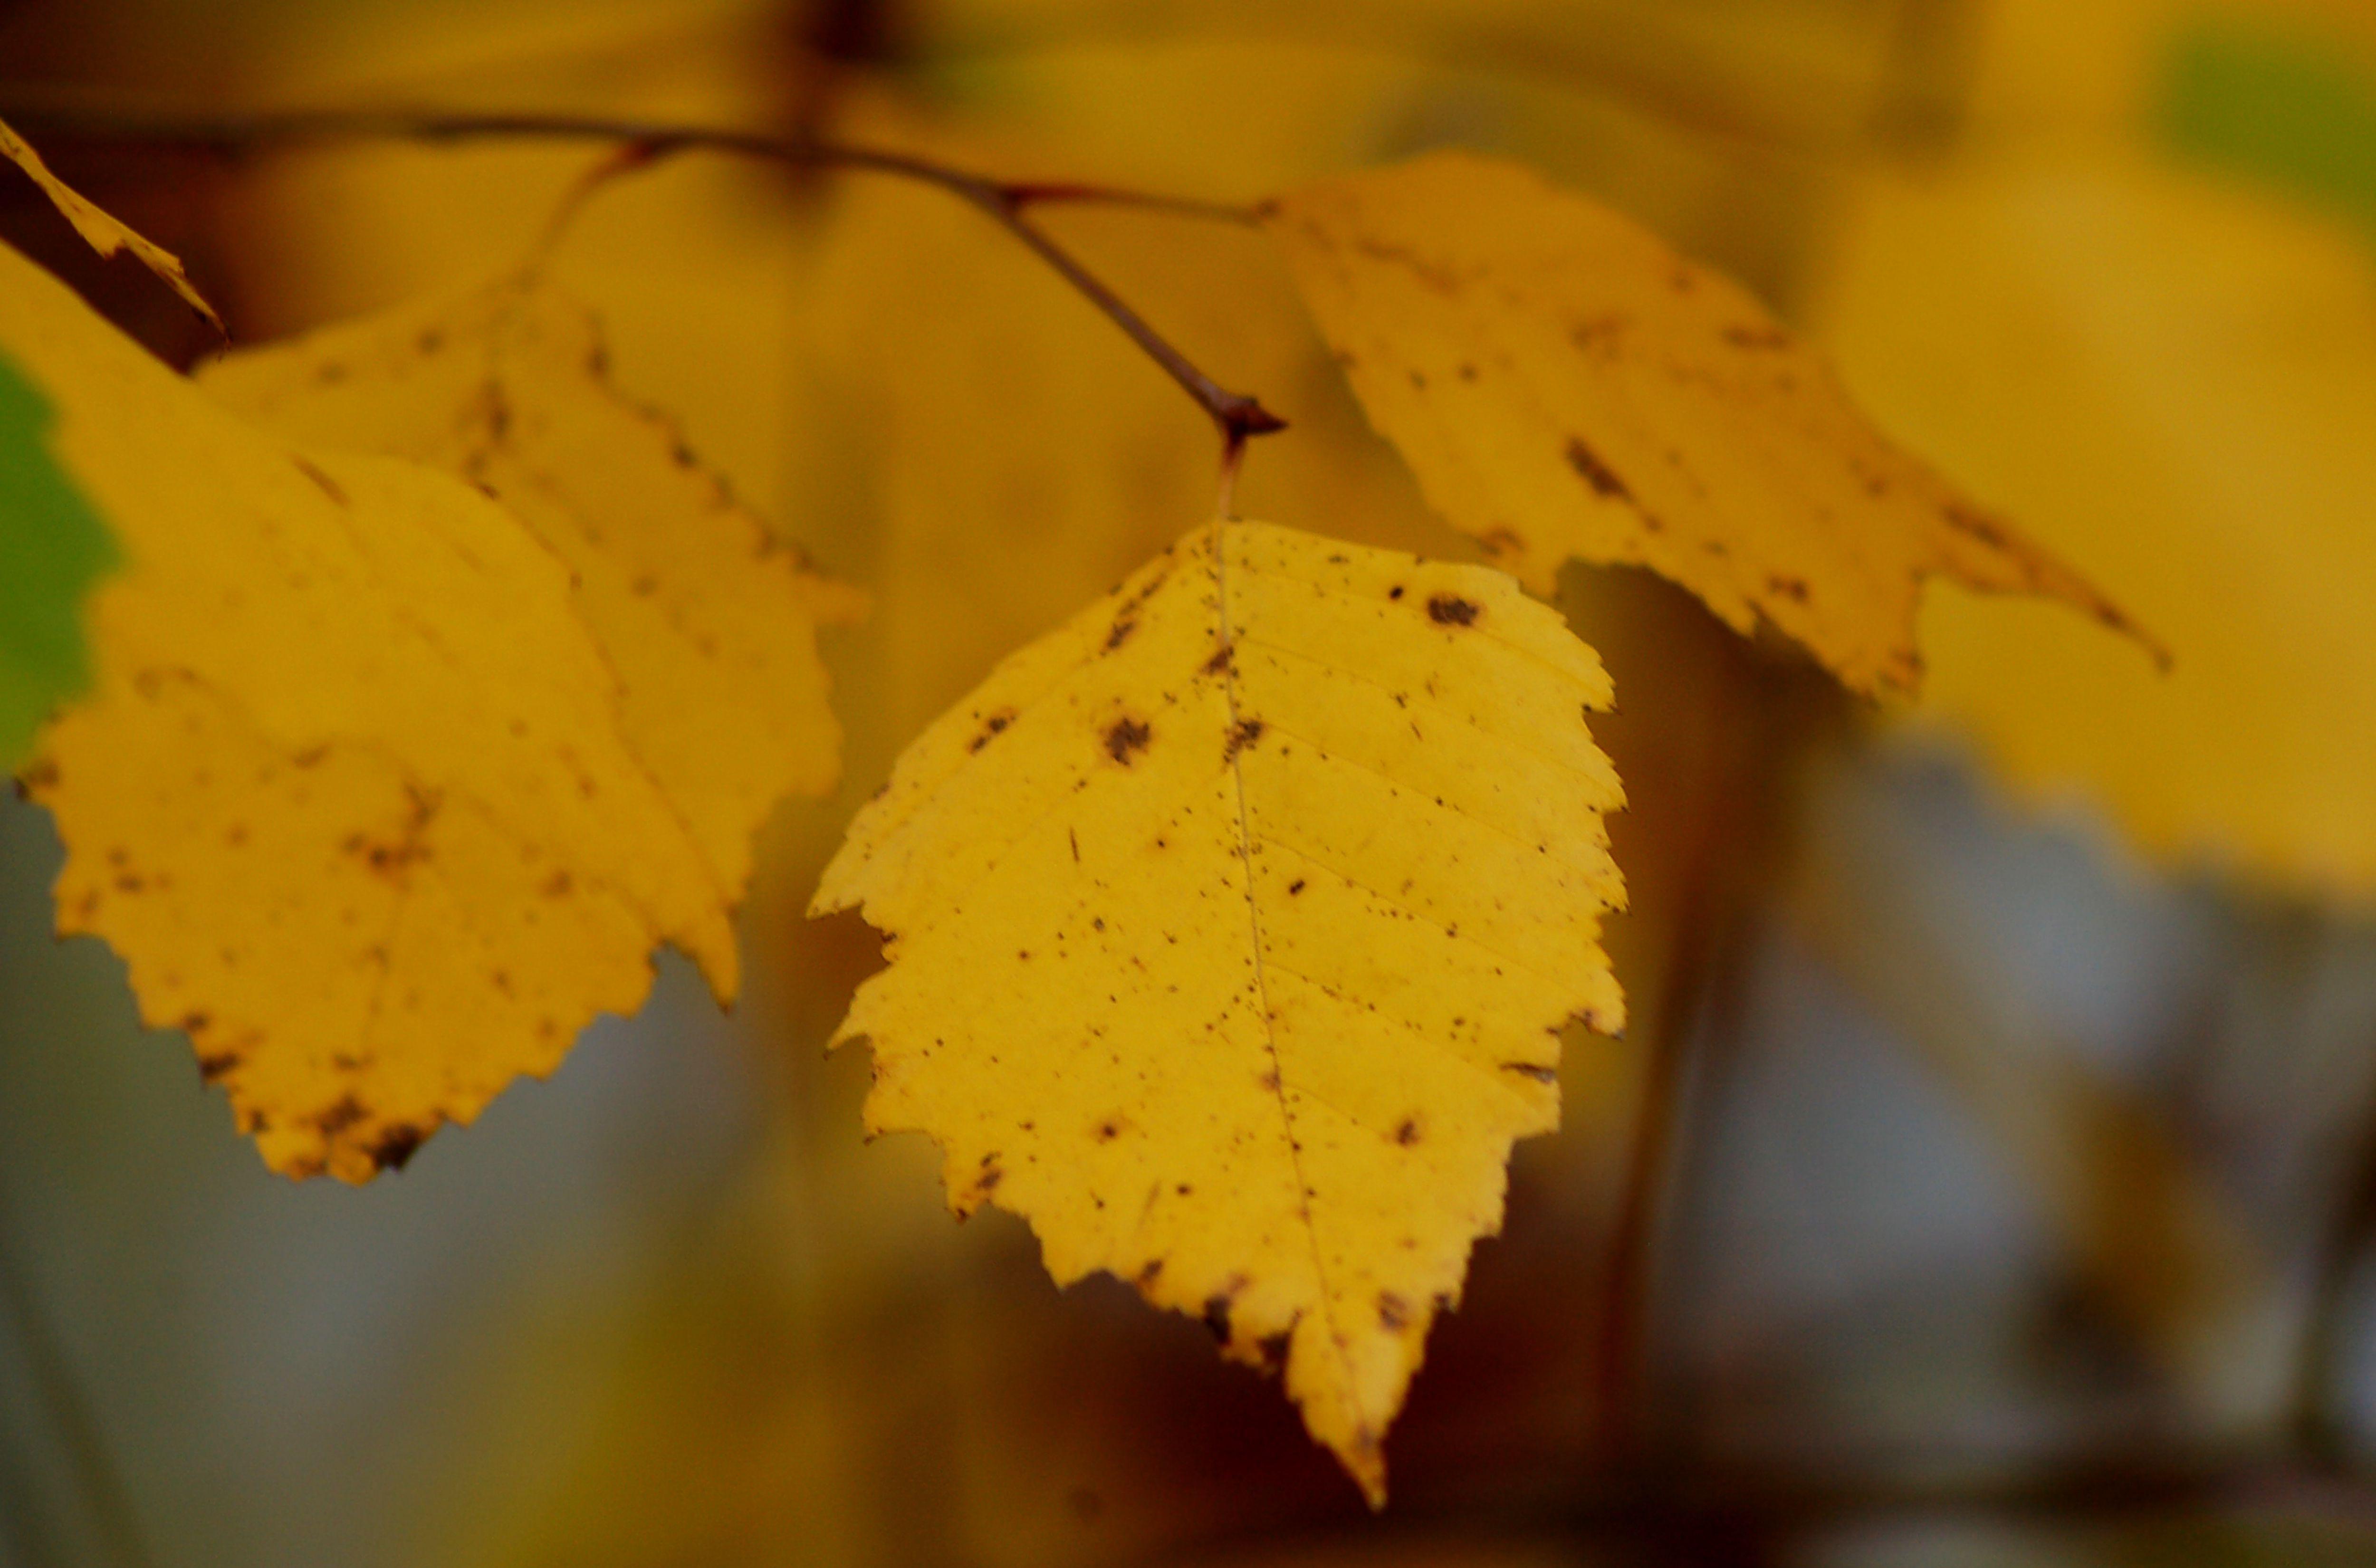 birch trees offer multi season interest